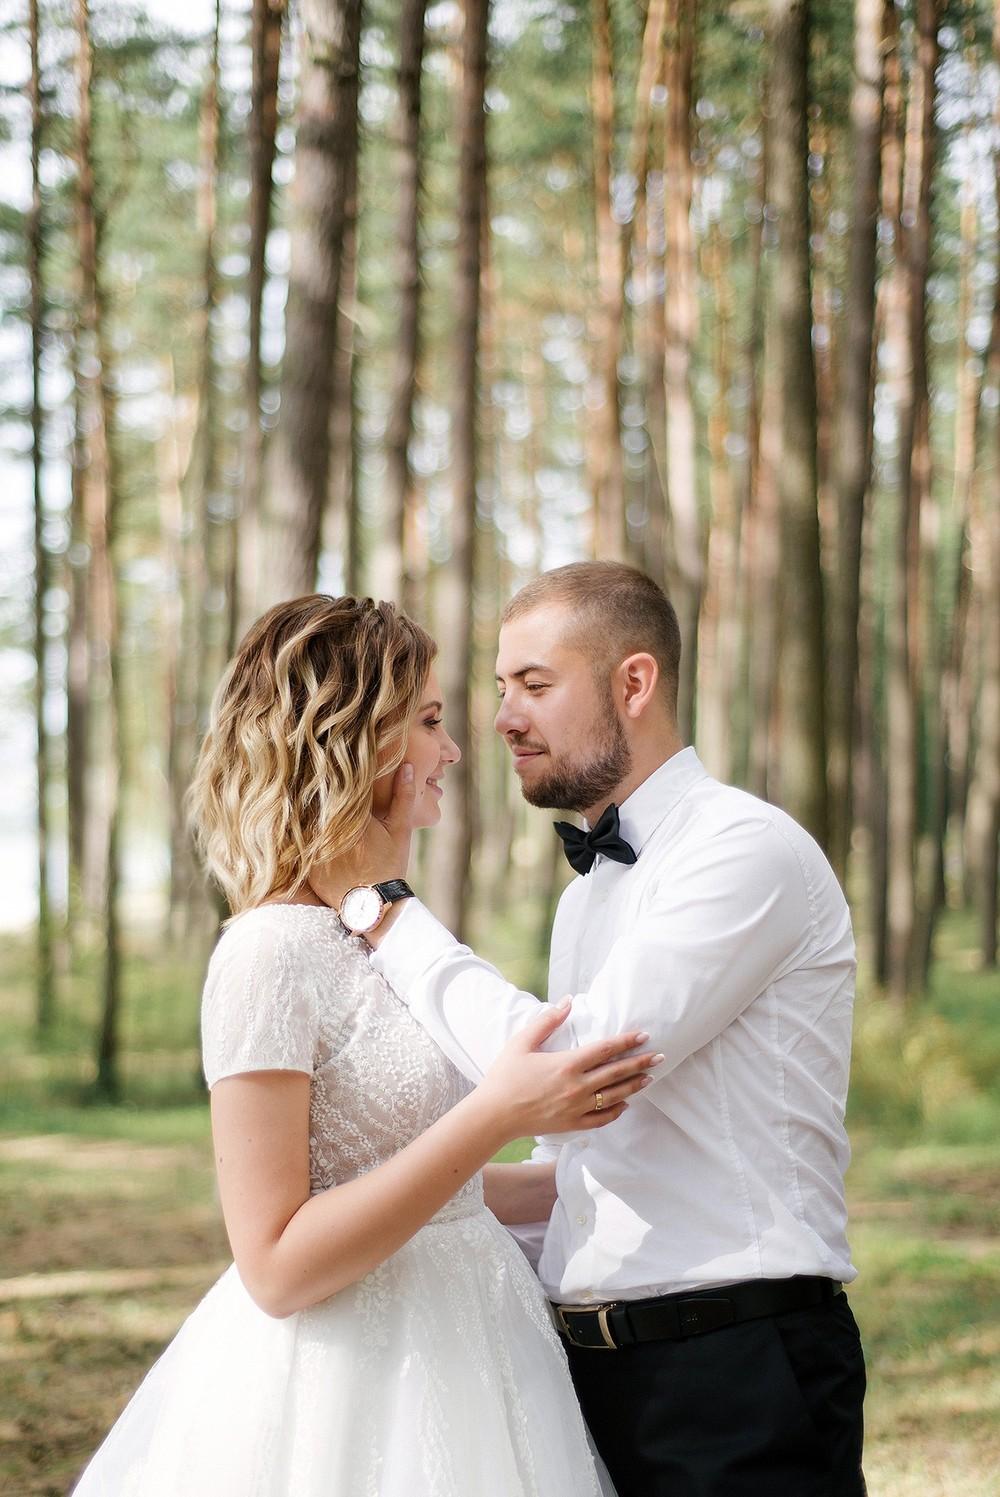 Alexander & Veronica